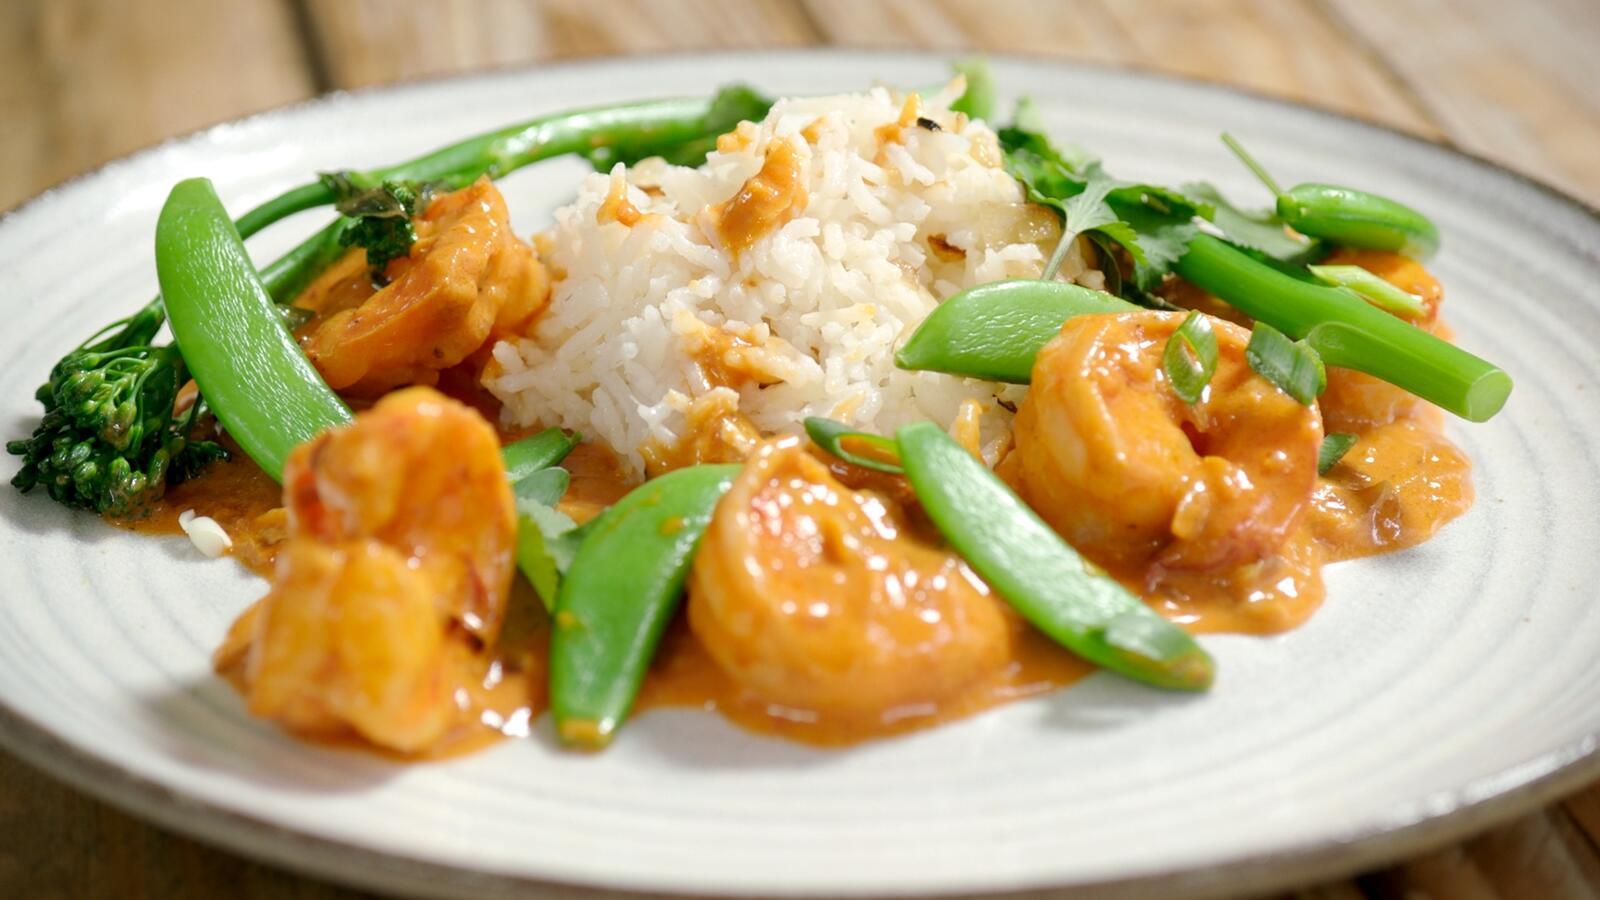 Pittige scampi met rijst